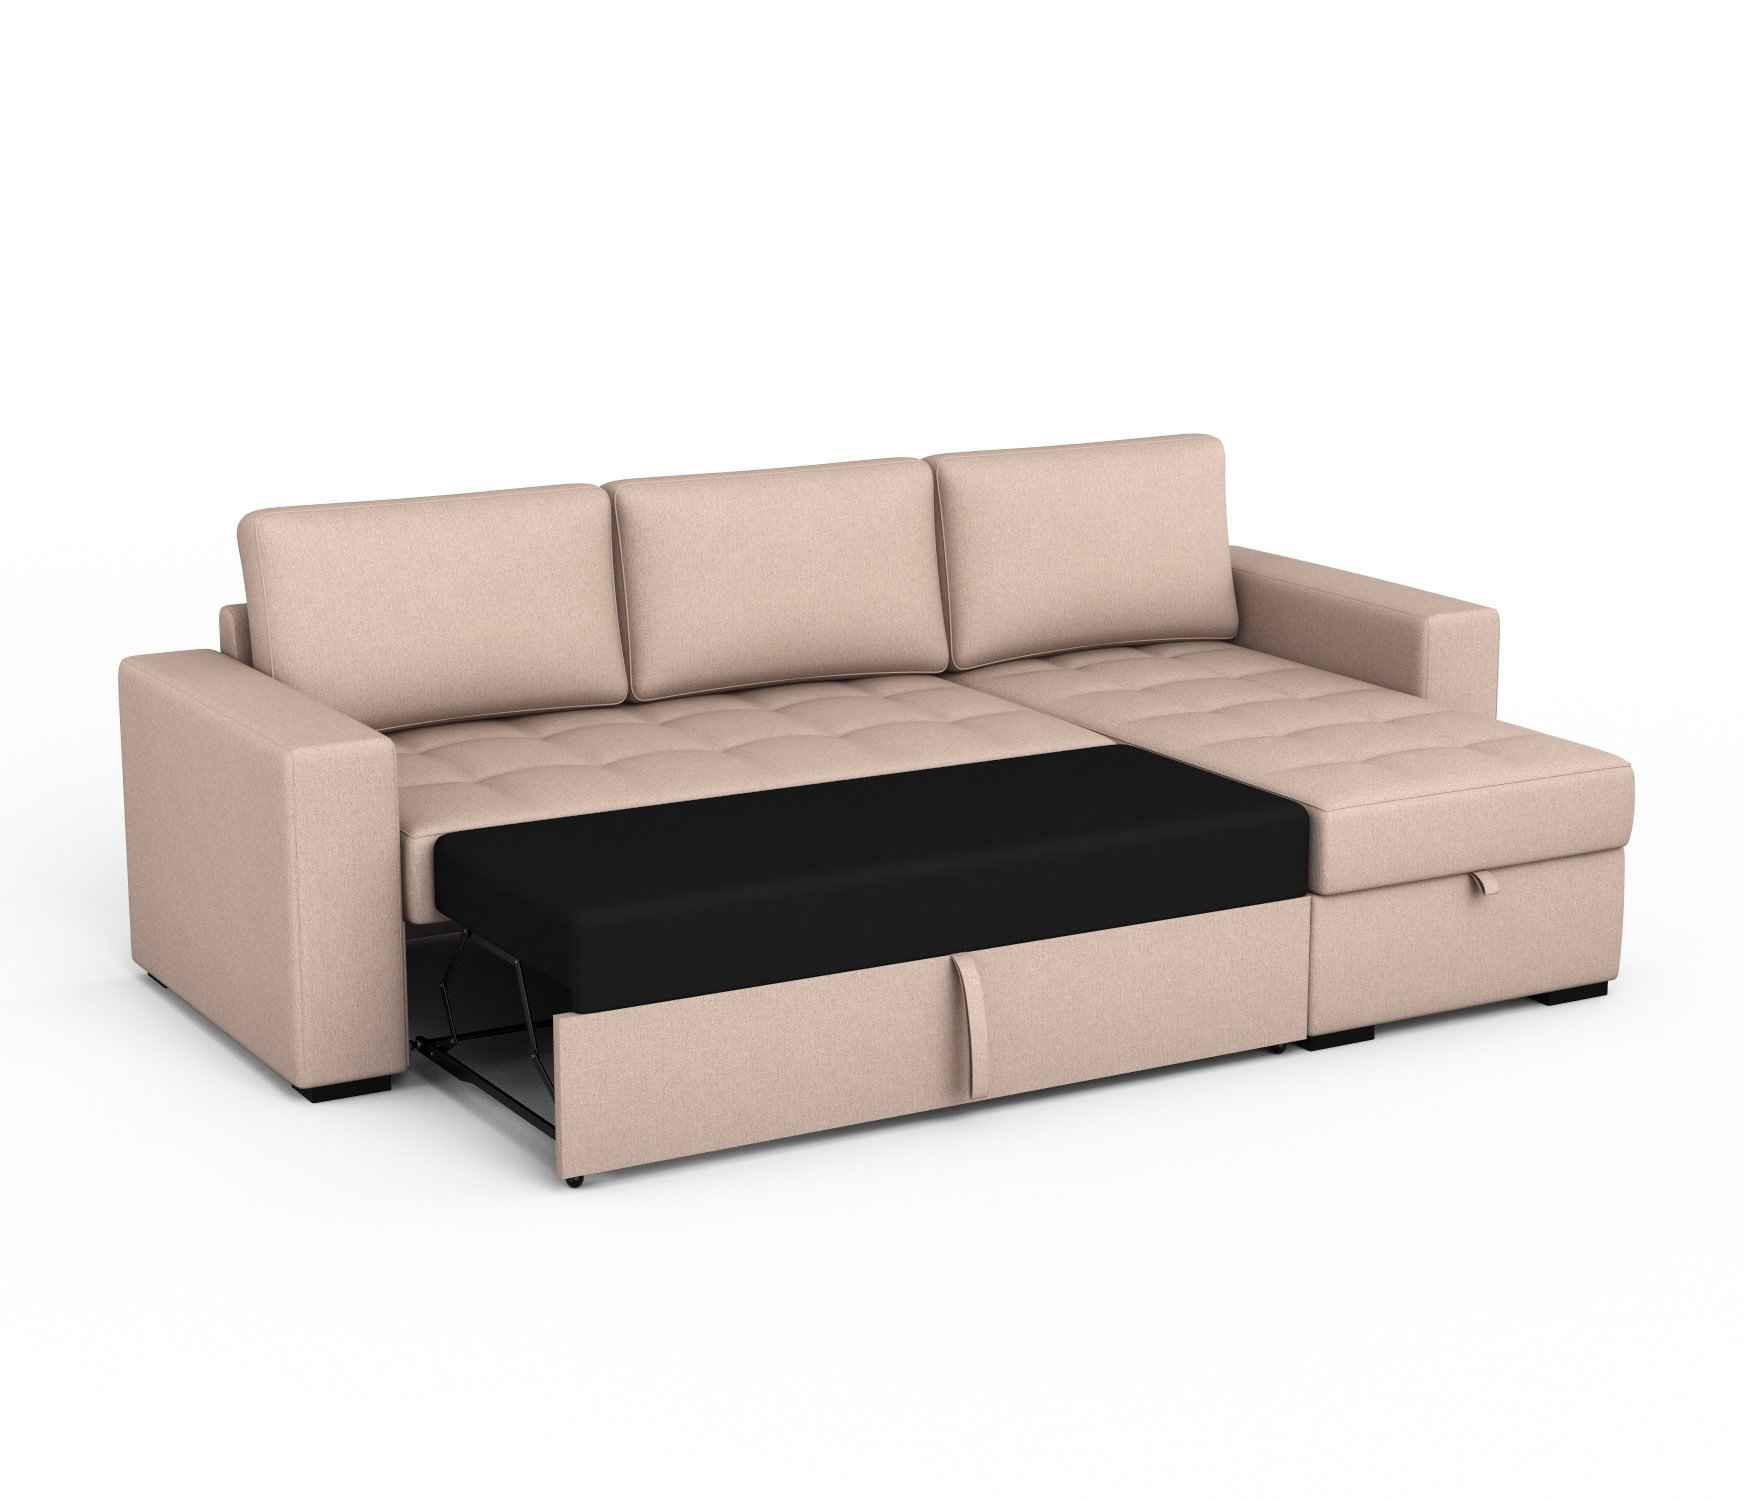 Sofa Cama Desplegable S5d8 Las Maravilloso sofa Cama Desplegable Proyecto Debido A Condecorar